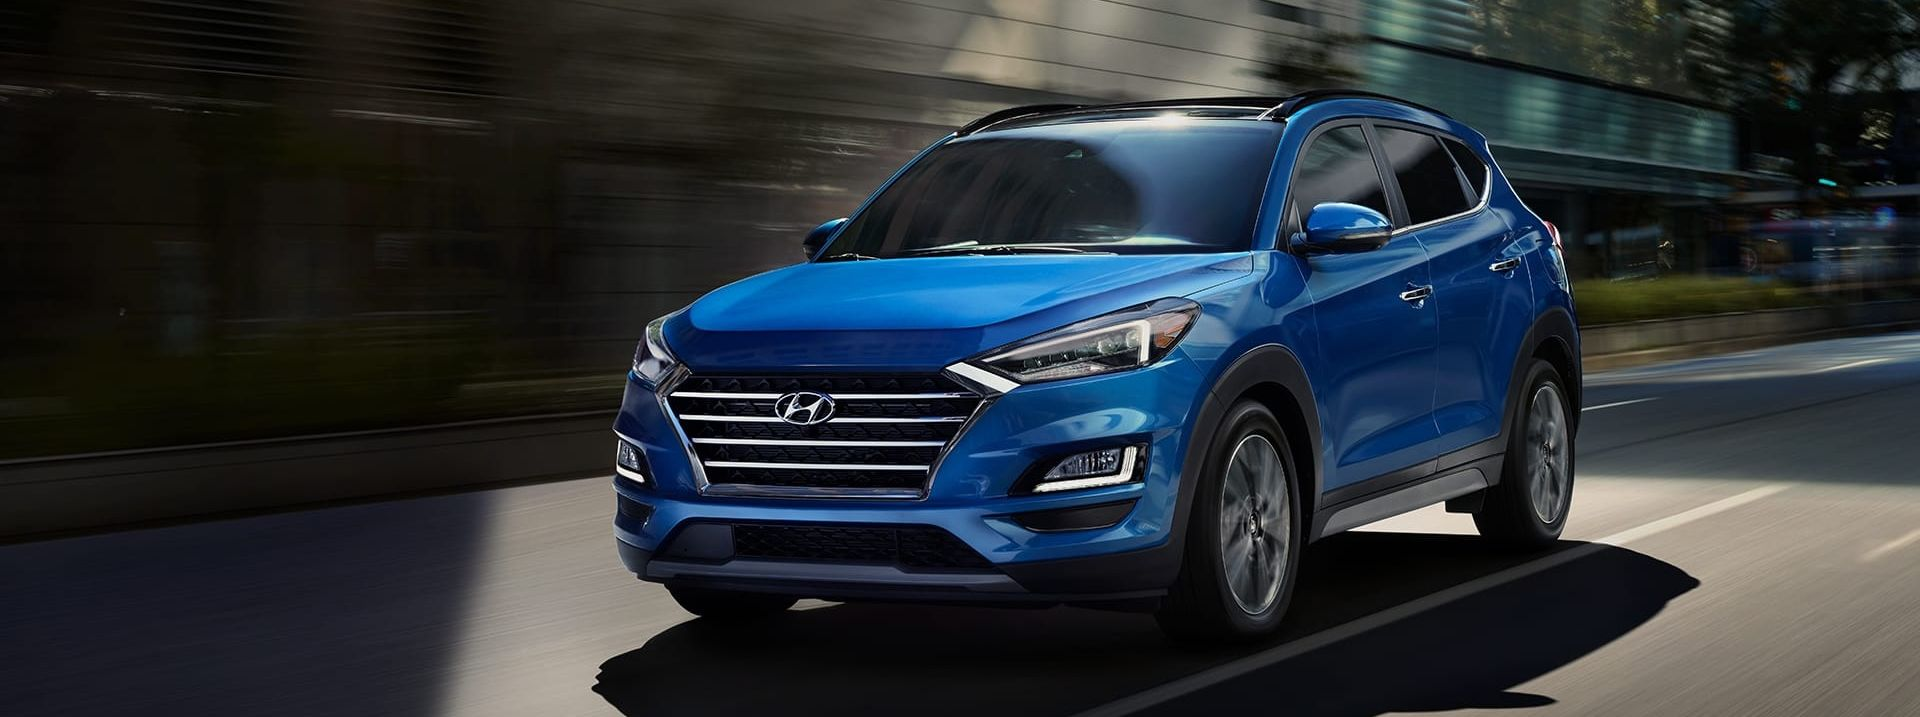 Hyundai Tucson 2019 a la venta cerca de Washington, DC